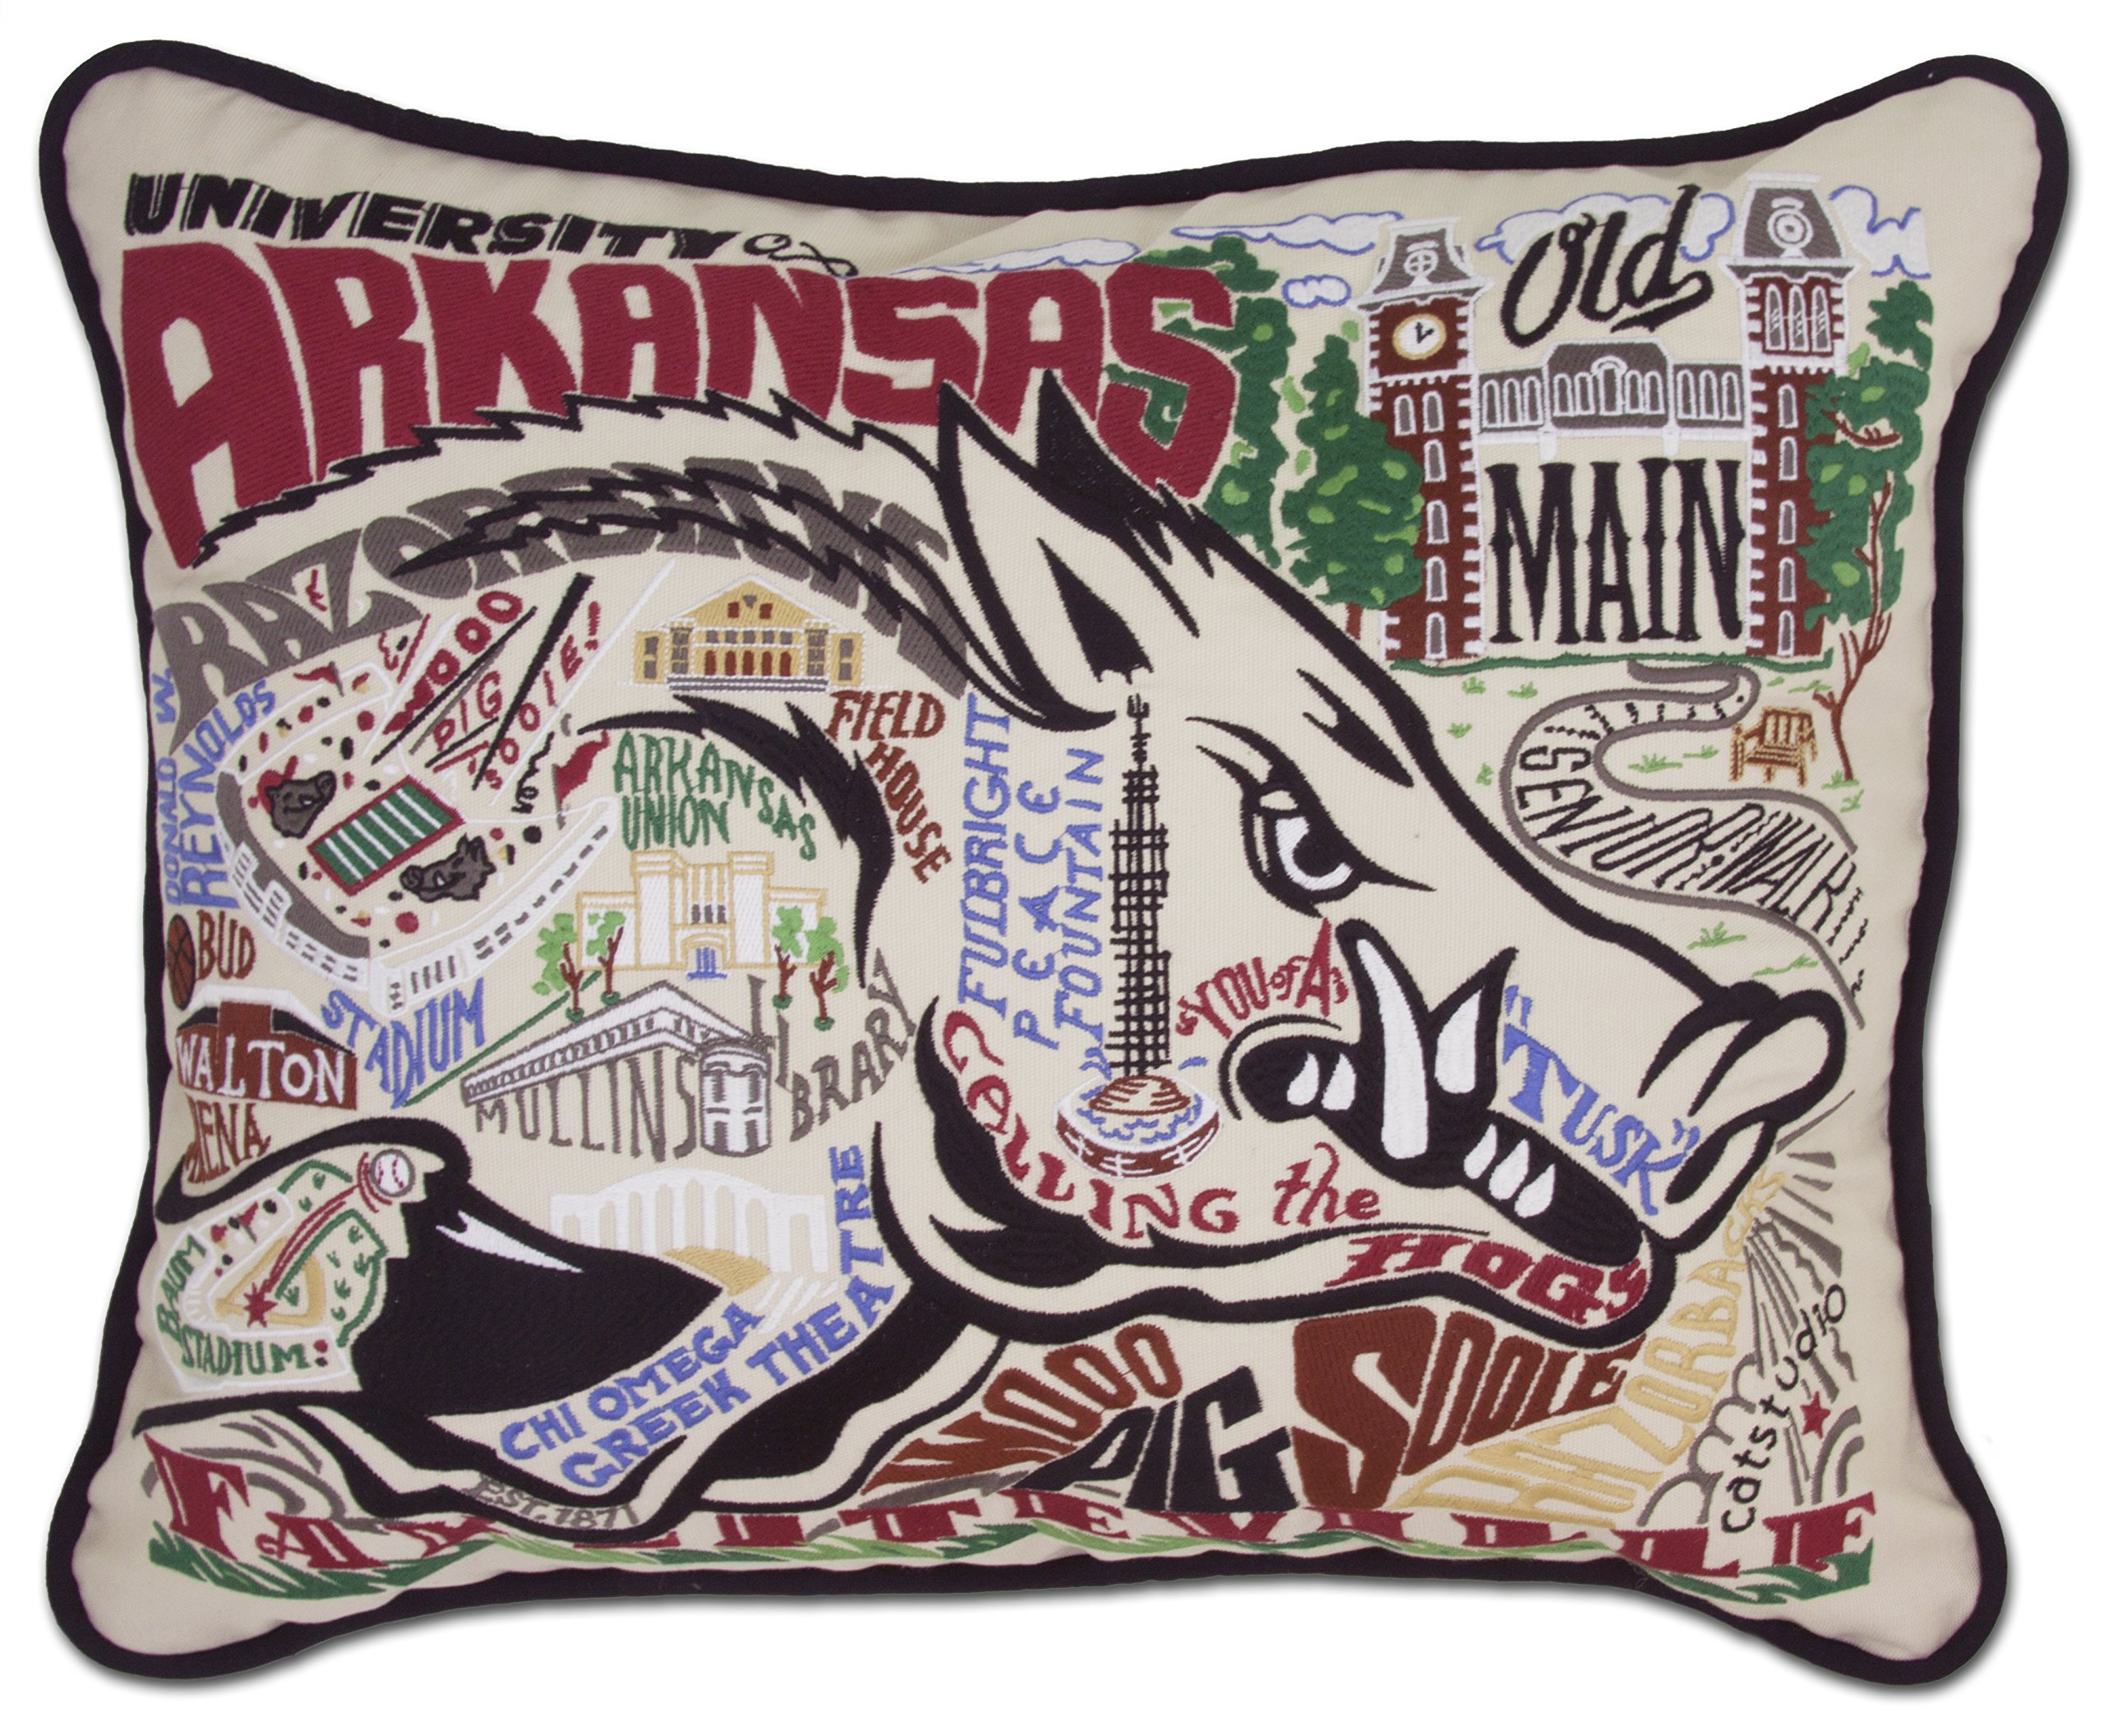 Catstudio University of Arkansas Embroidered Throw Pillow - 16'' x 20''